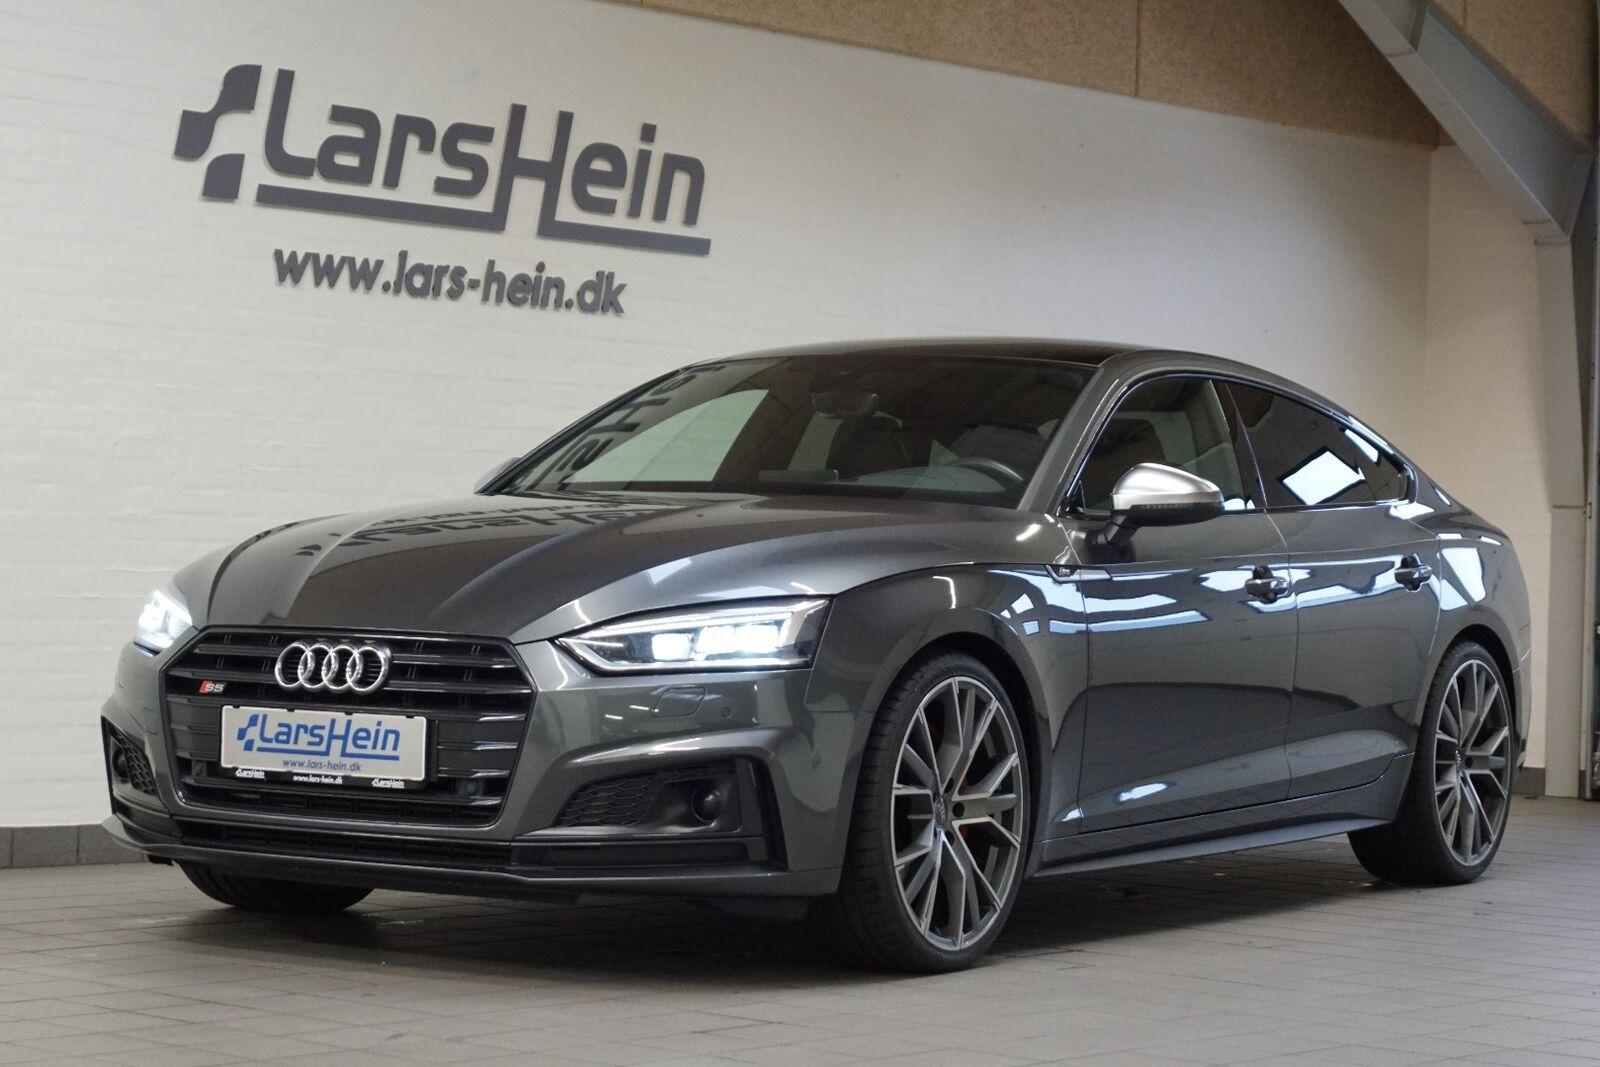 Audi S5 3,0 TFSi SB quattro Tiptr. 5d